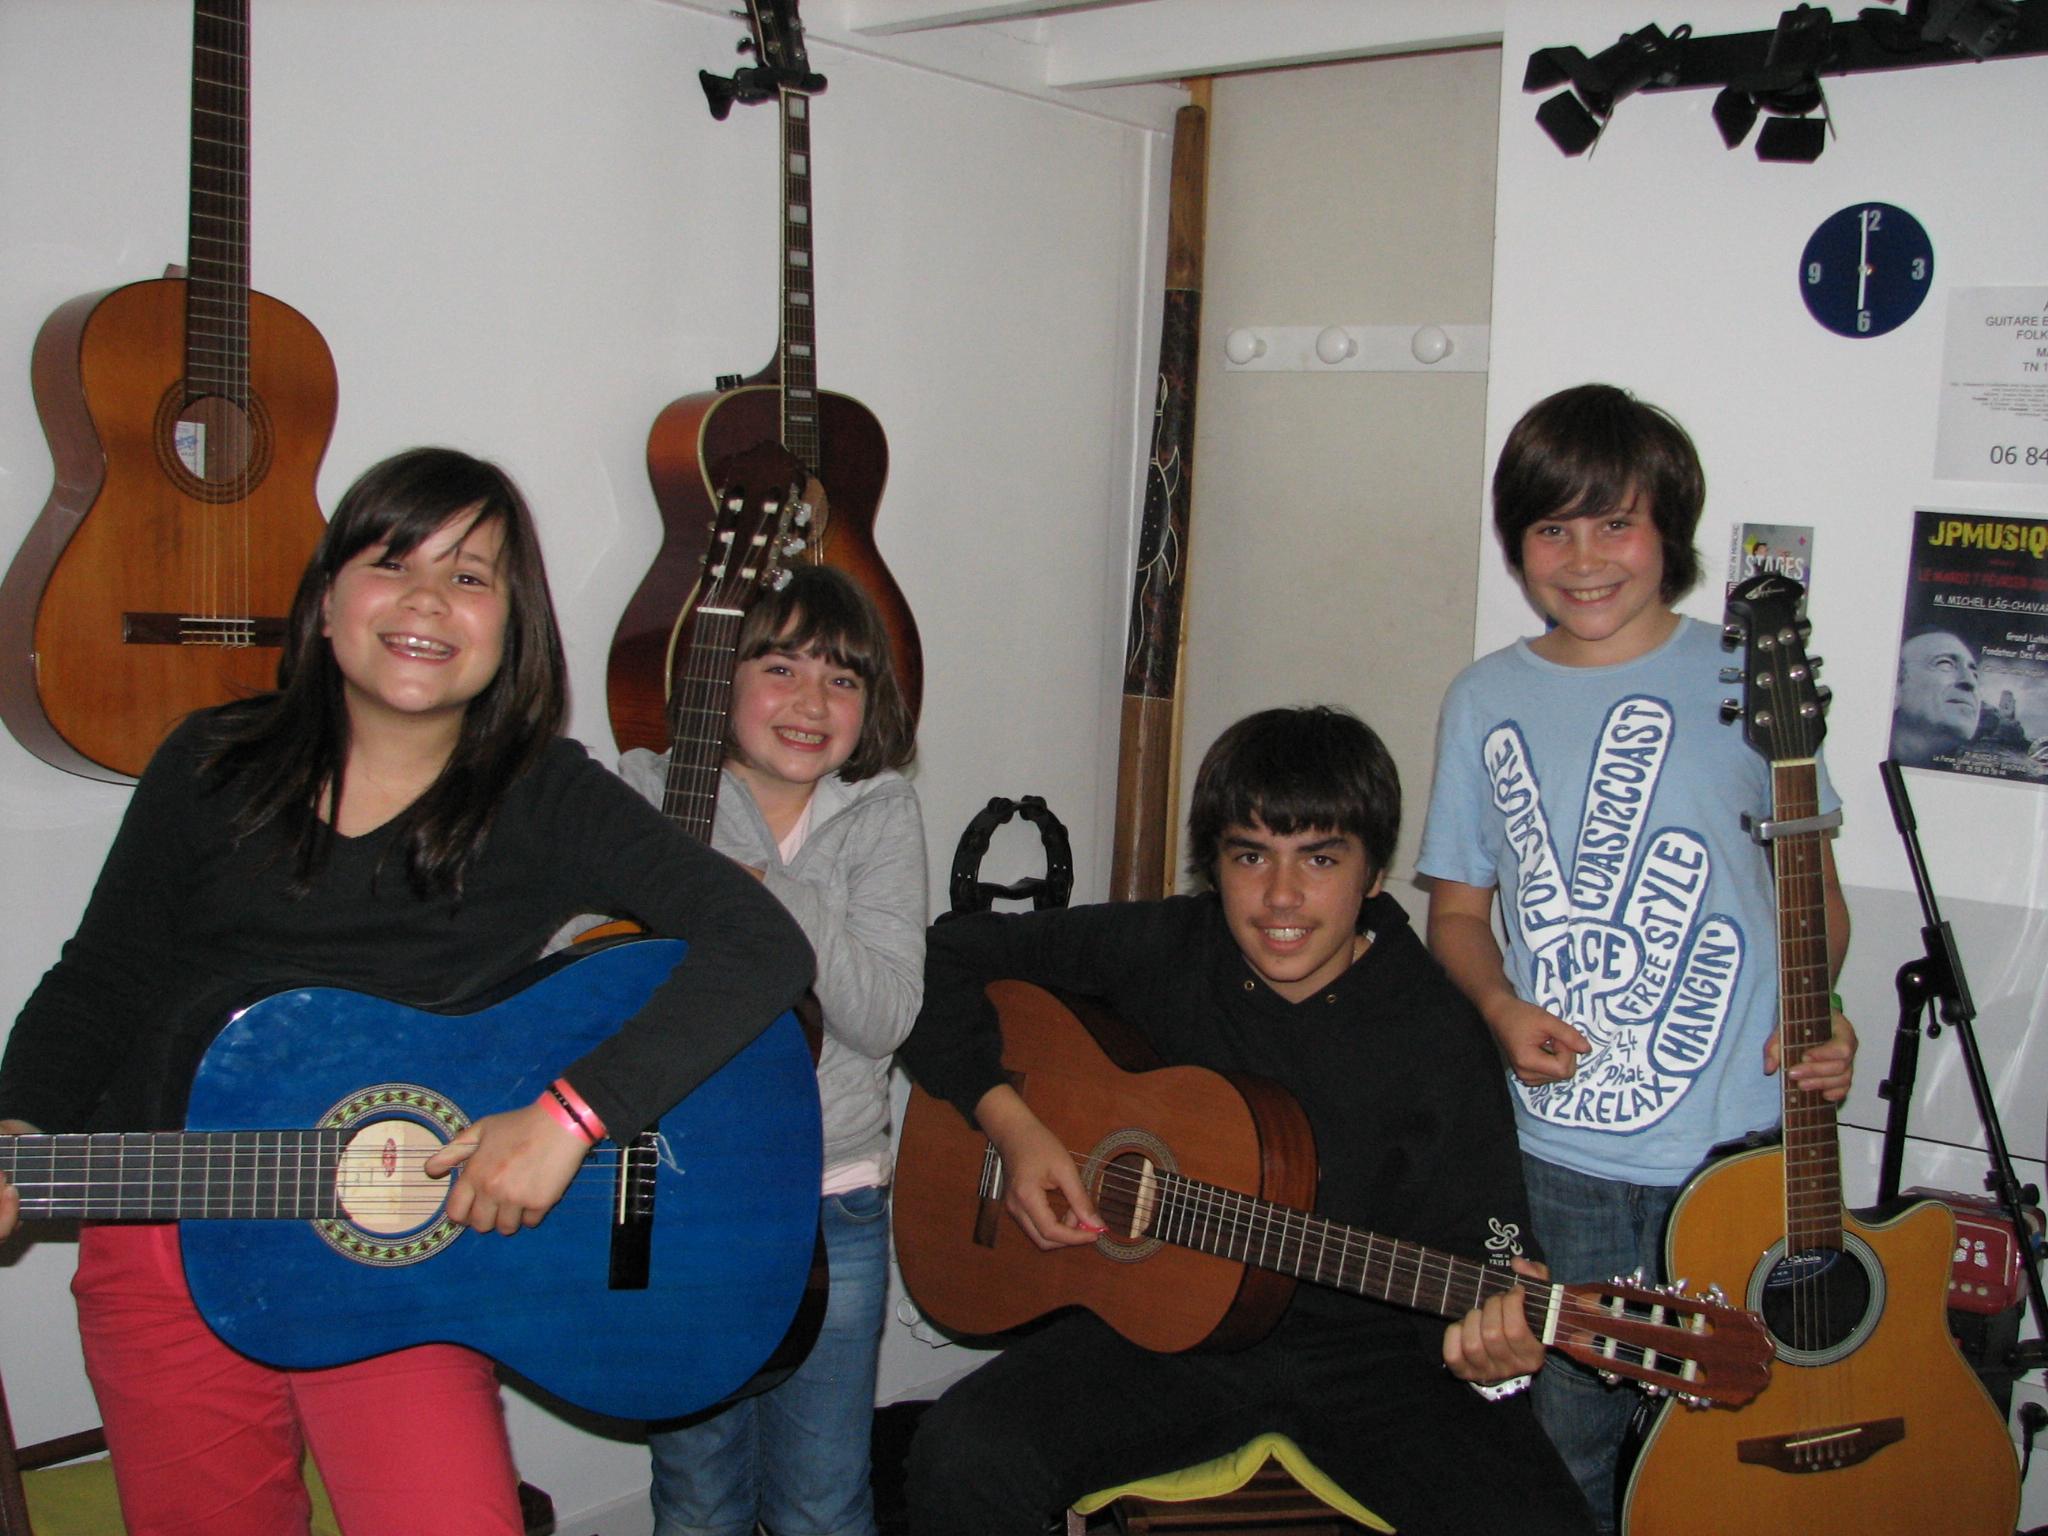 Marie-louna, Ana, Viviant et Paul